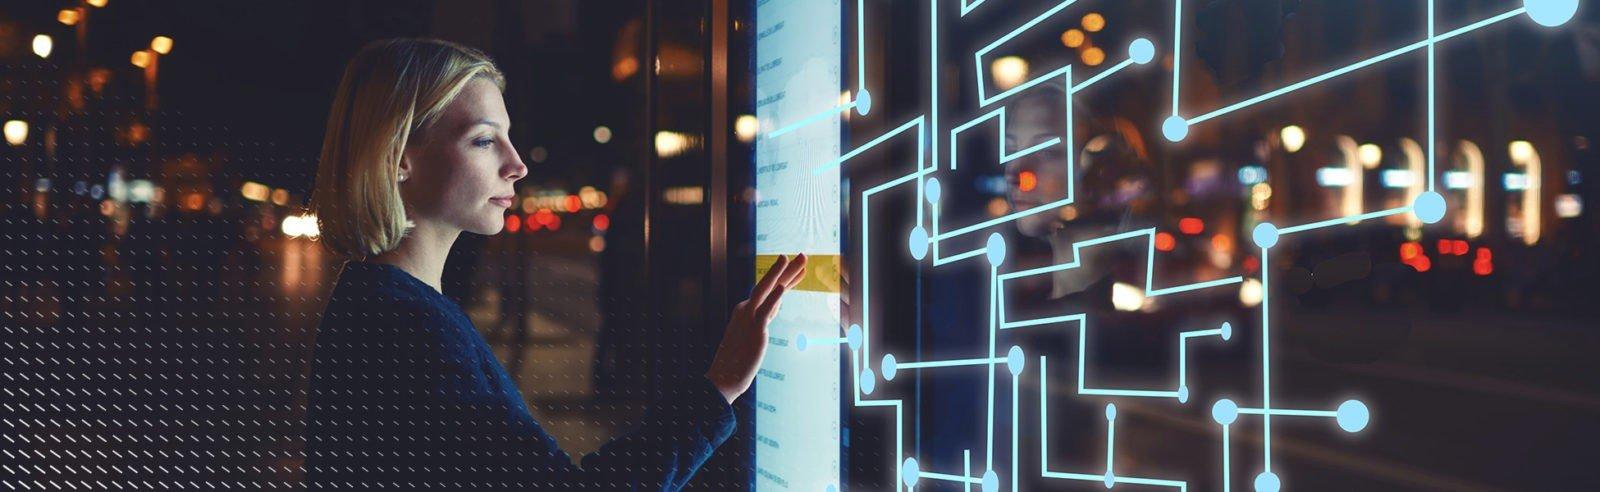 Intelligent business automation